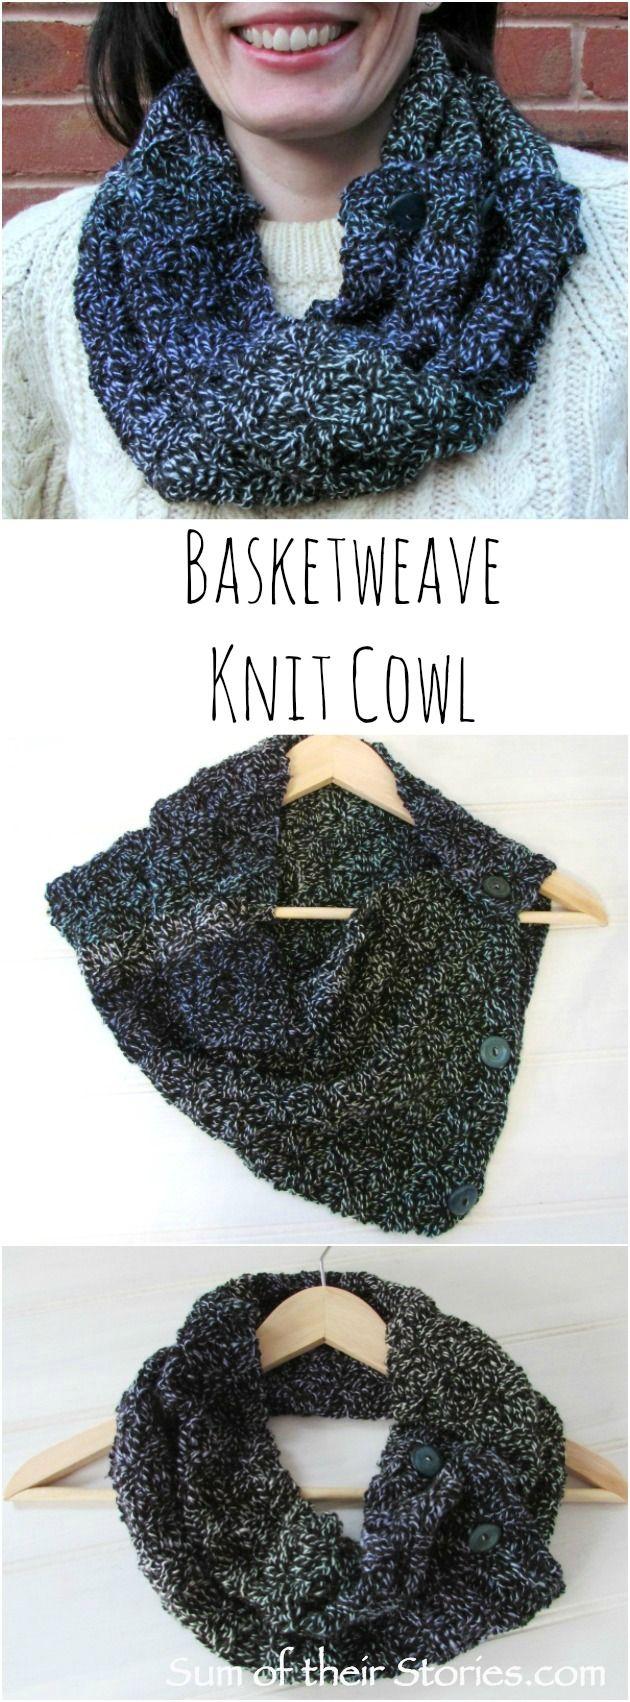 Basketweave Knit Cowl — Sum of their Stories Craft Blog ...